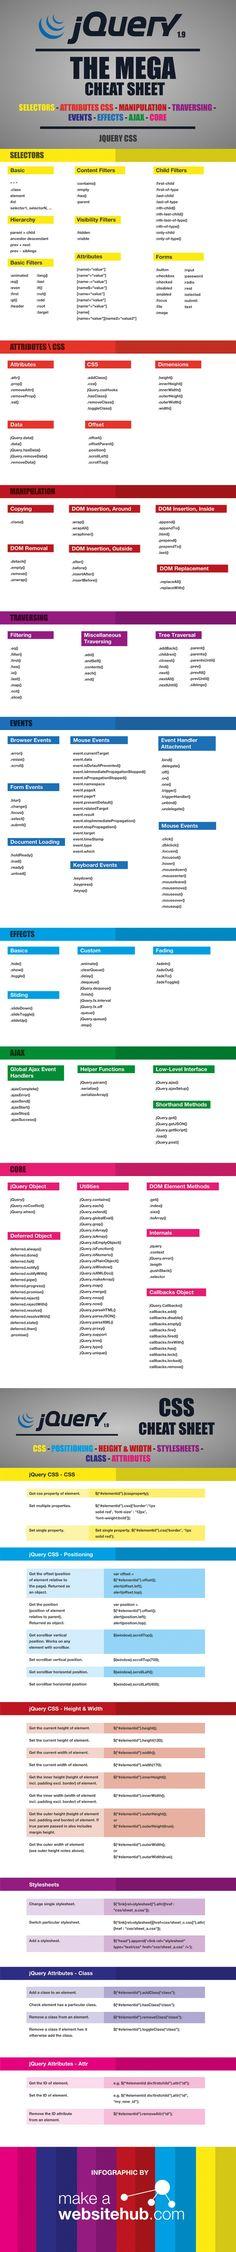 jQuery-Cheat-Sheet. (Grafik: MakeAWebsiteHub.com)…